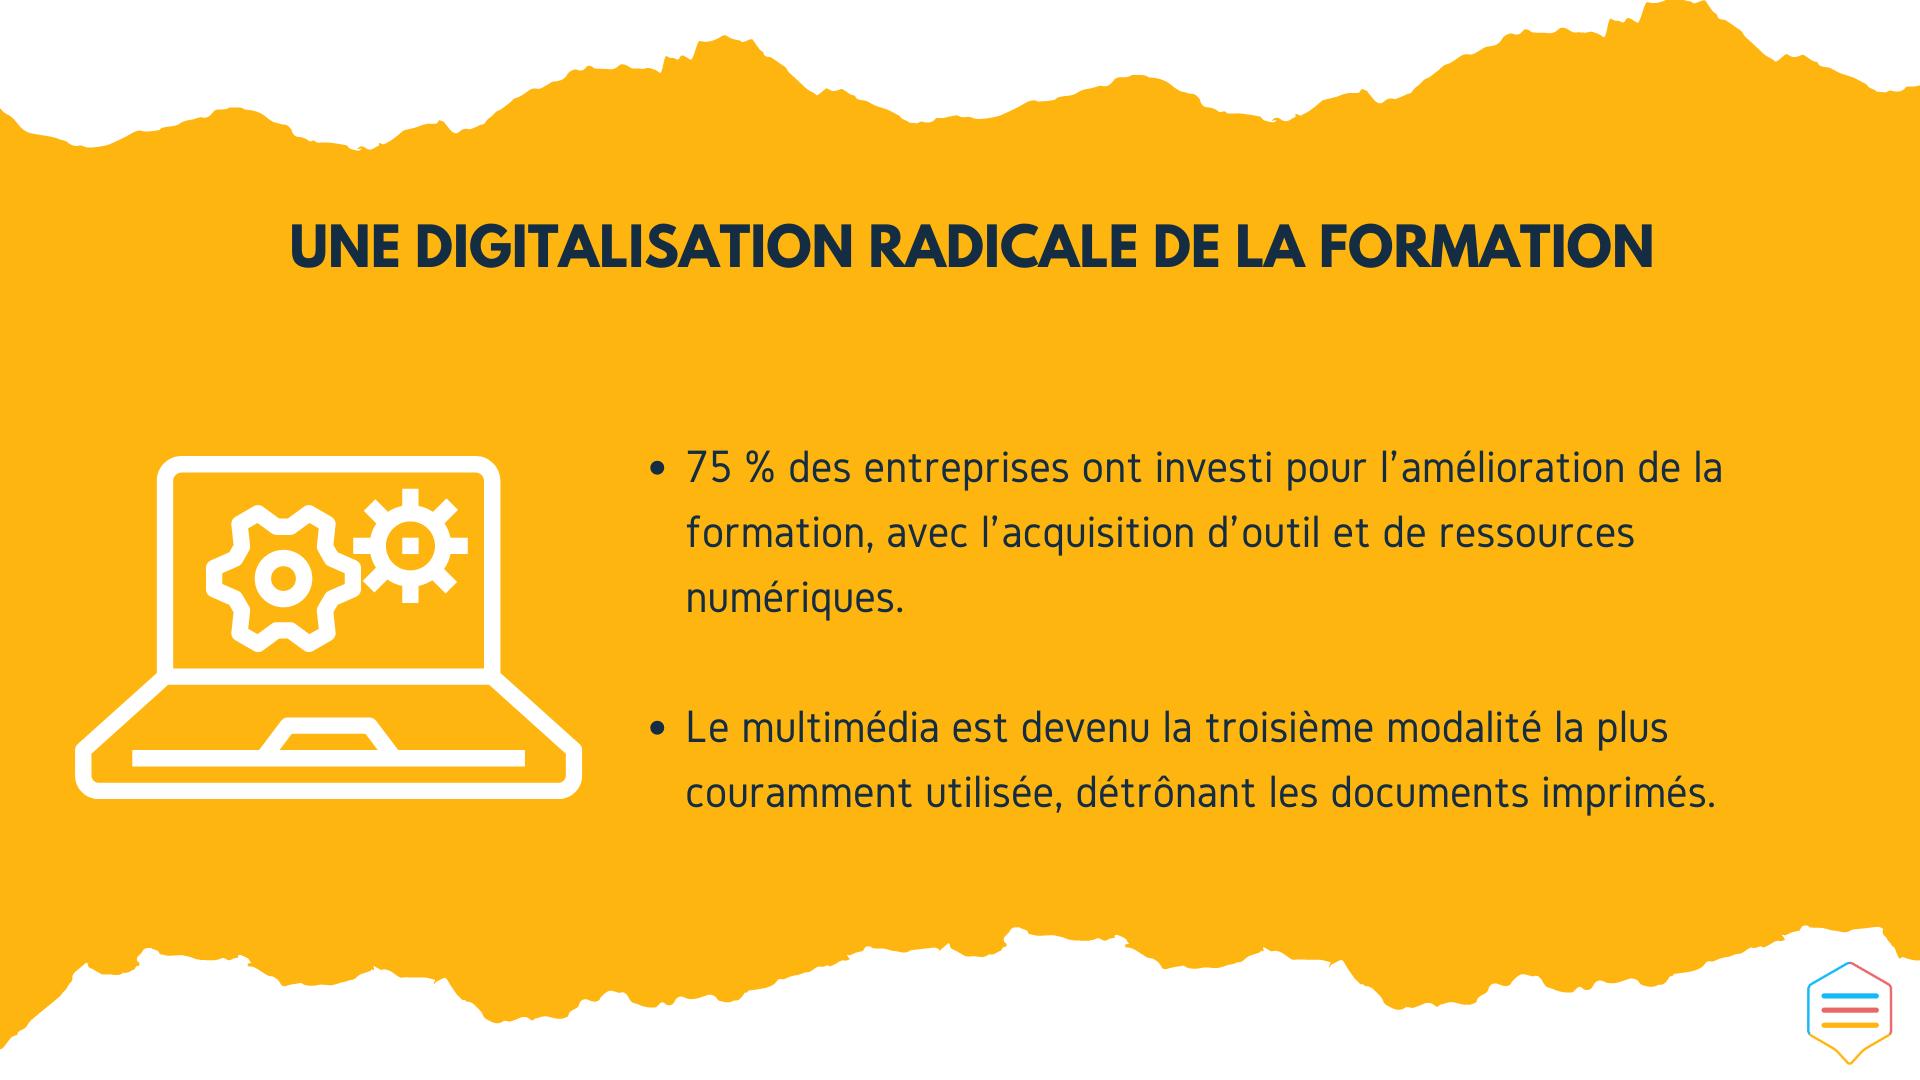 Une digitalisation radicale de la formation